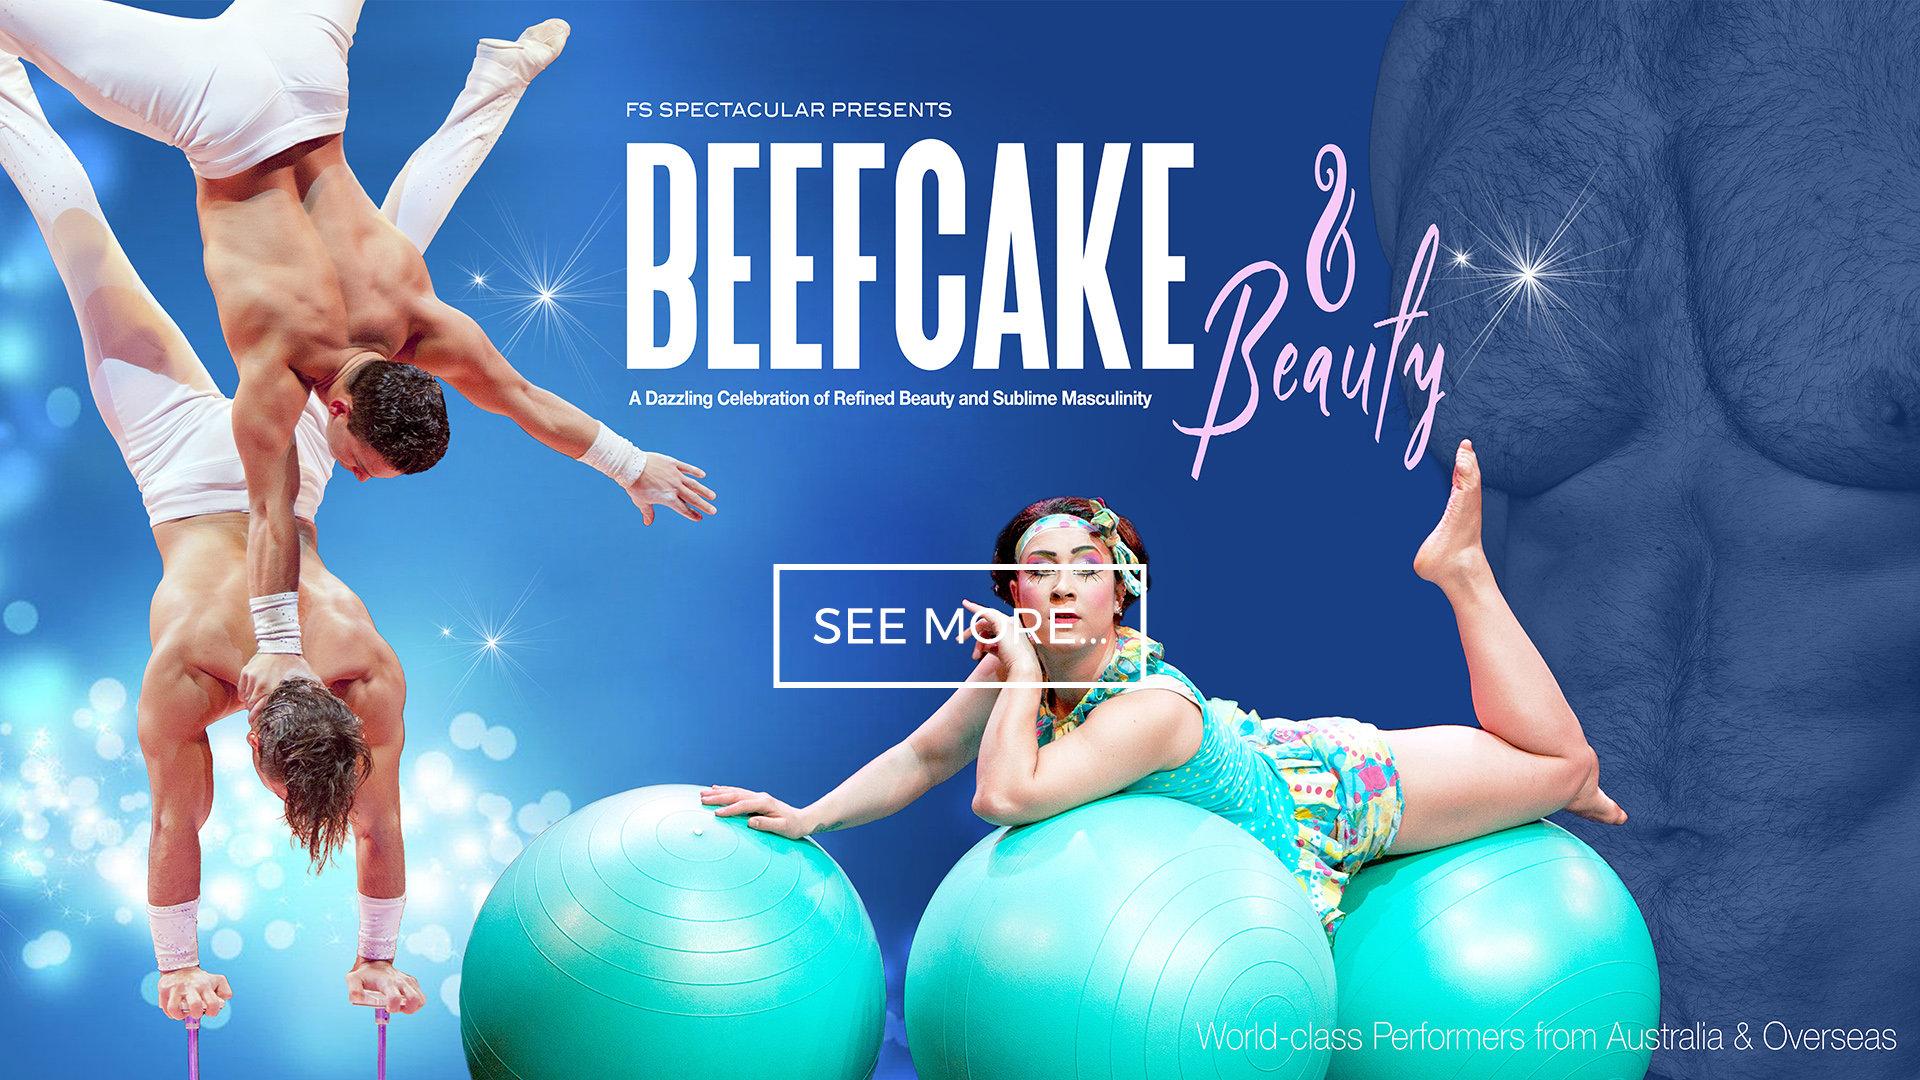 Beefcake and Beauty